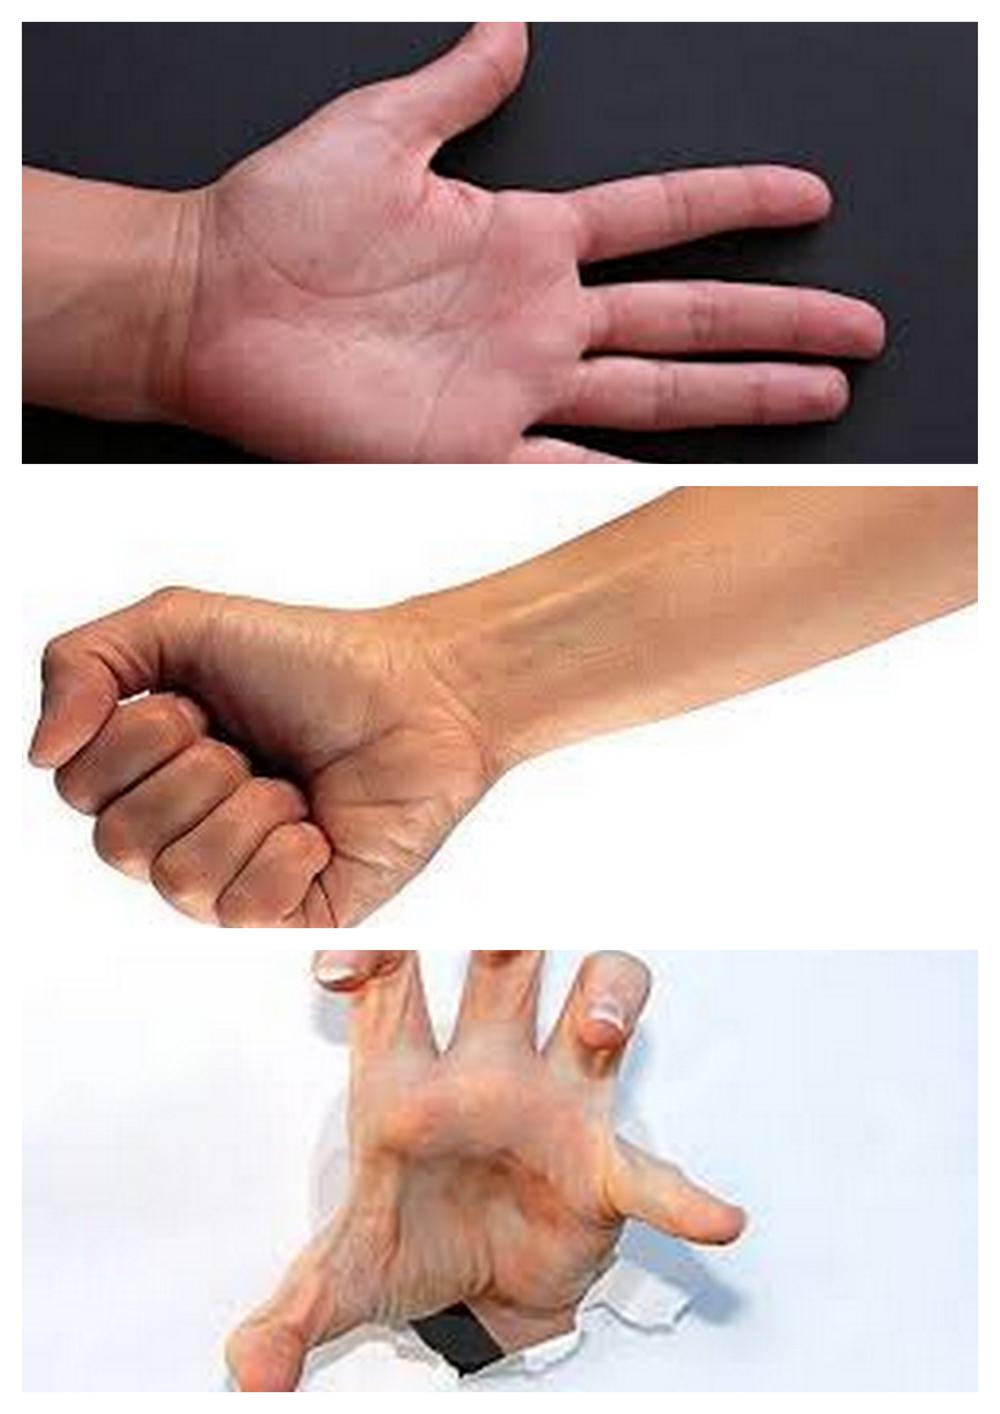 Puño, palma y garra